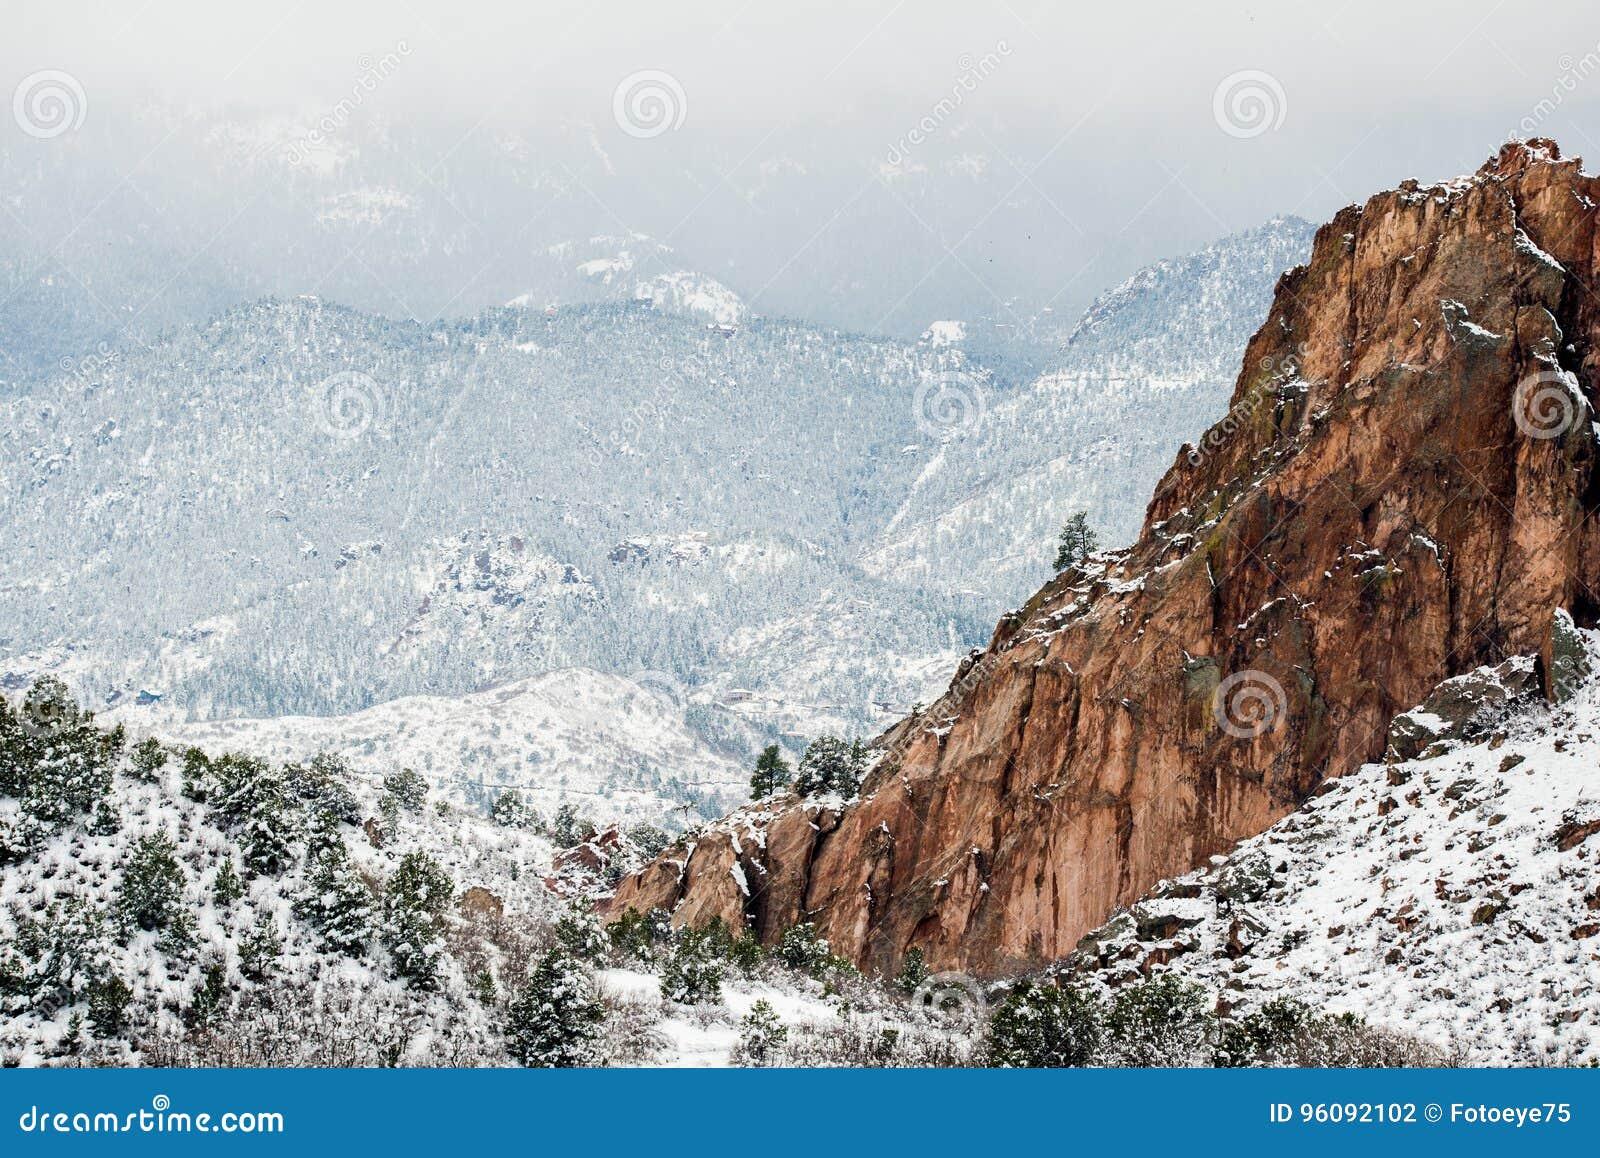 Garden Of The Gods Winter Snow Stock Photo Image Of Frozen